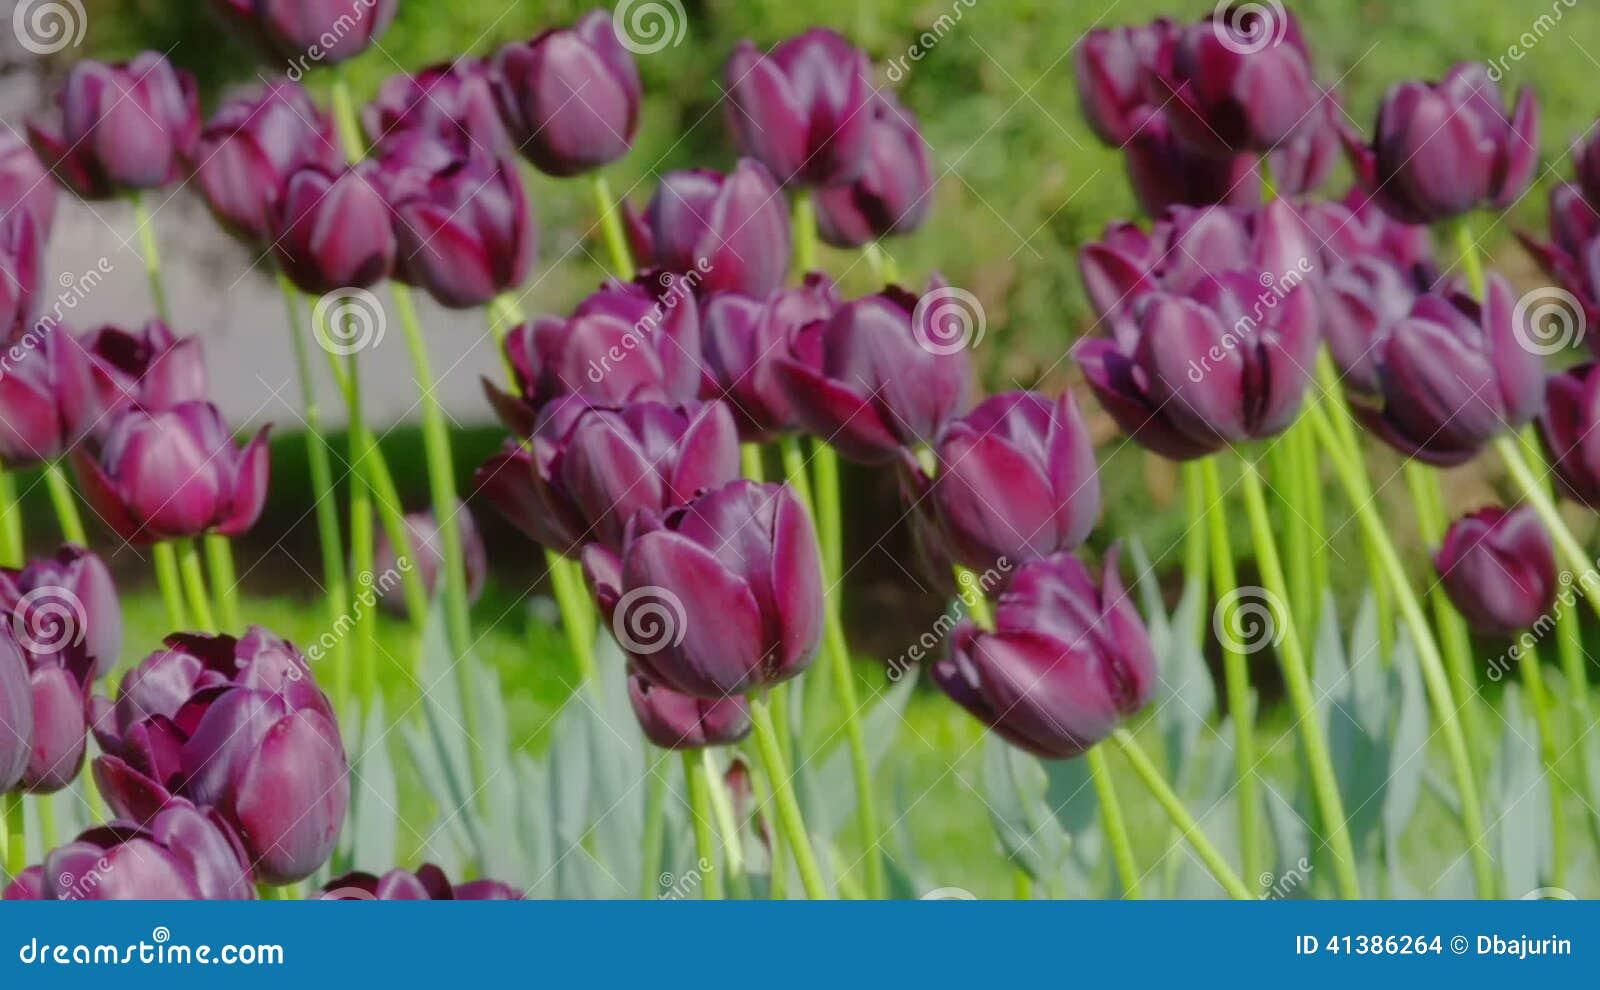 dark purple tulips stock footage image of growth floral 41386264